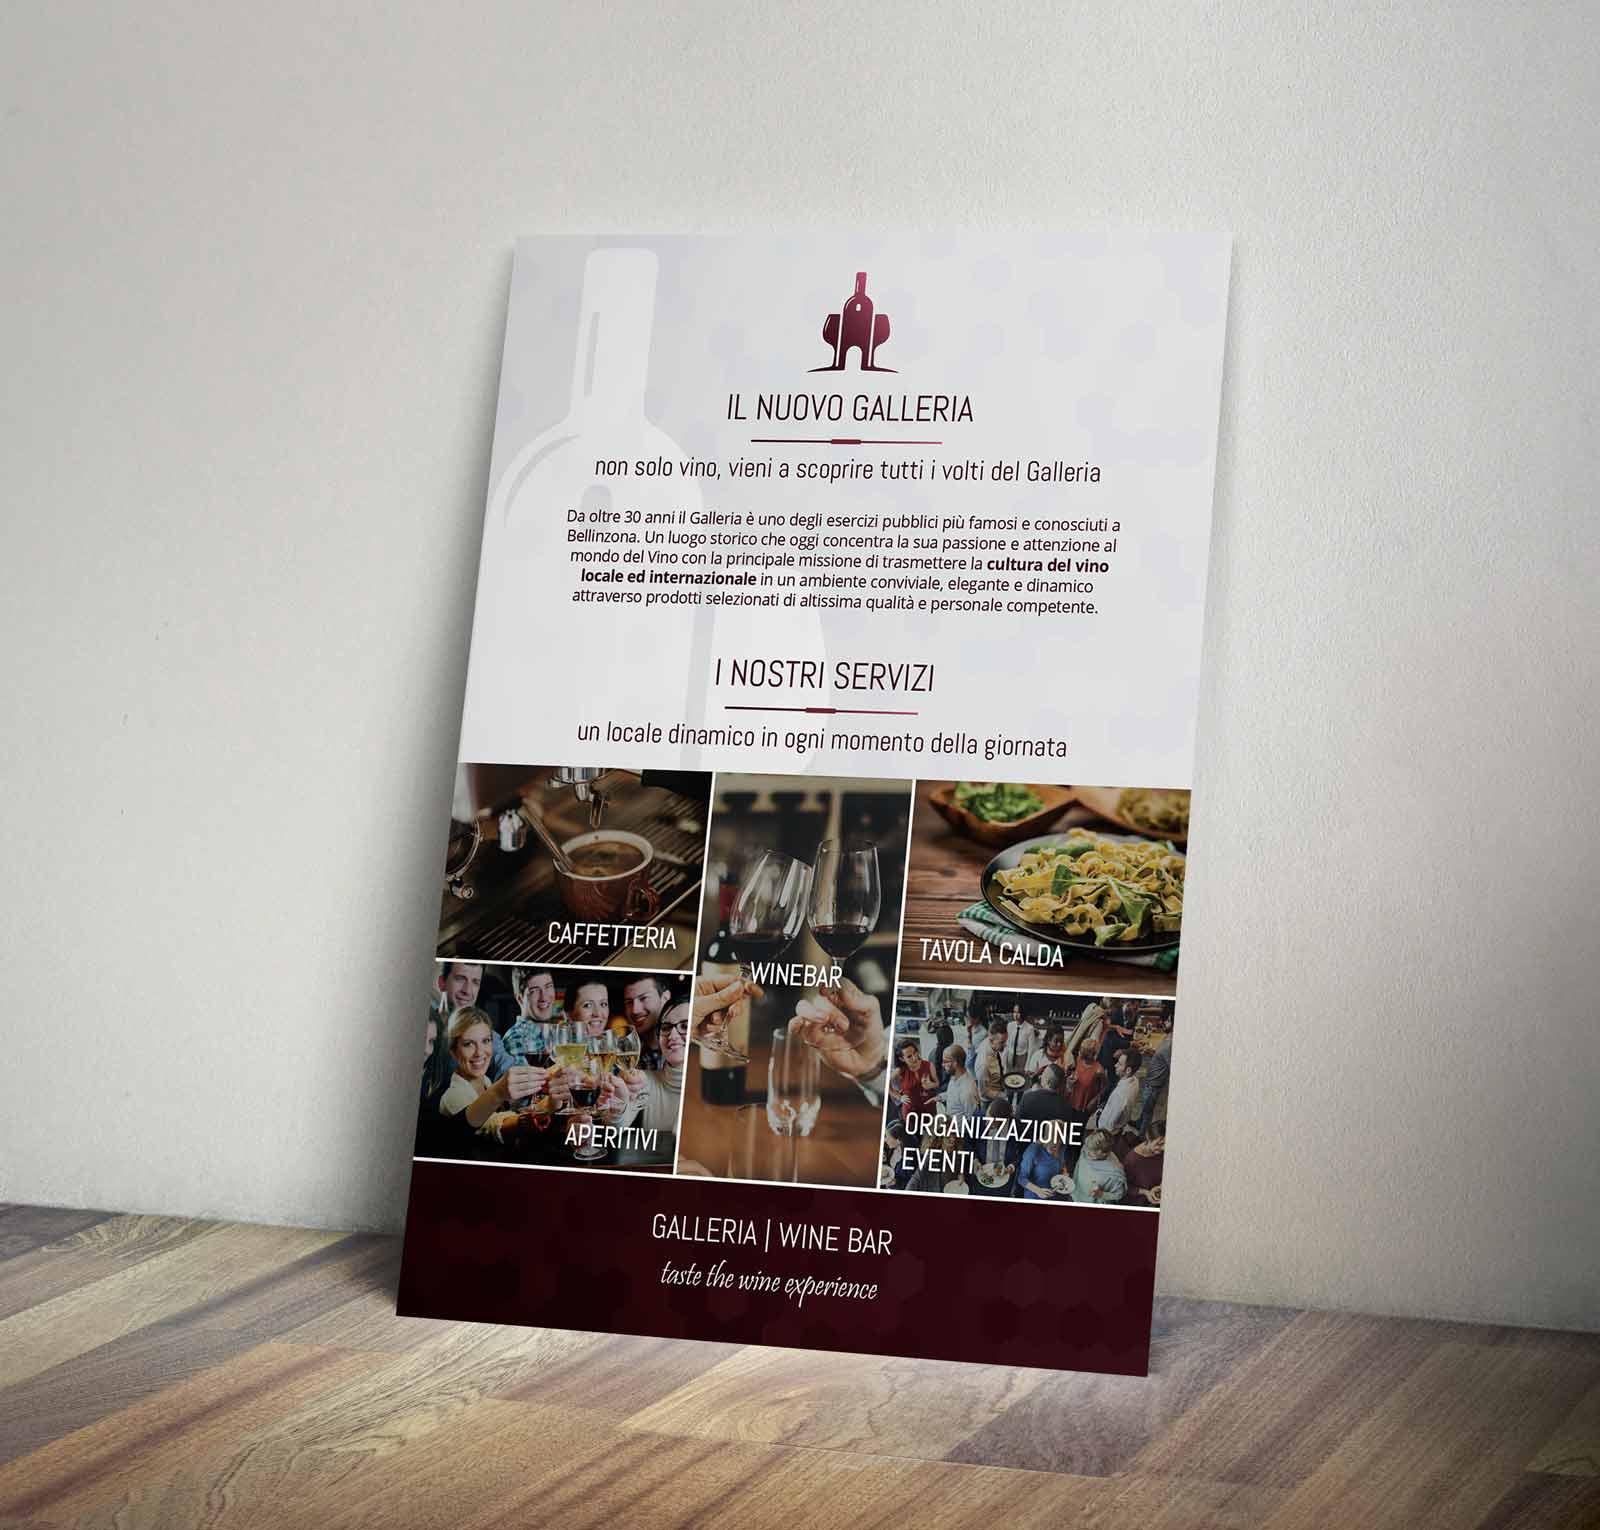 flyer-galleria-winebar-canton-ticino-manthea